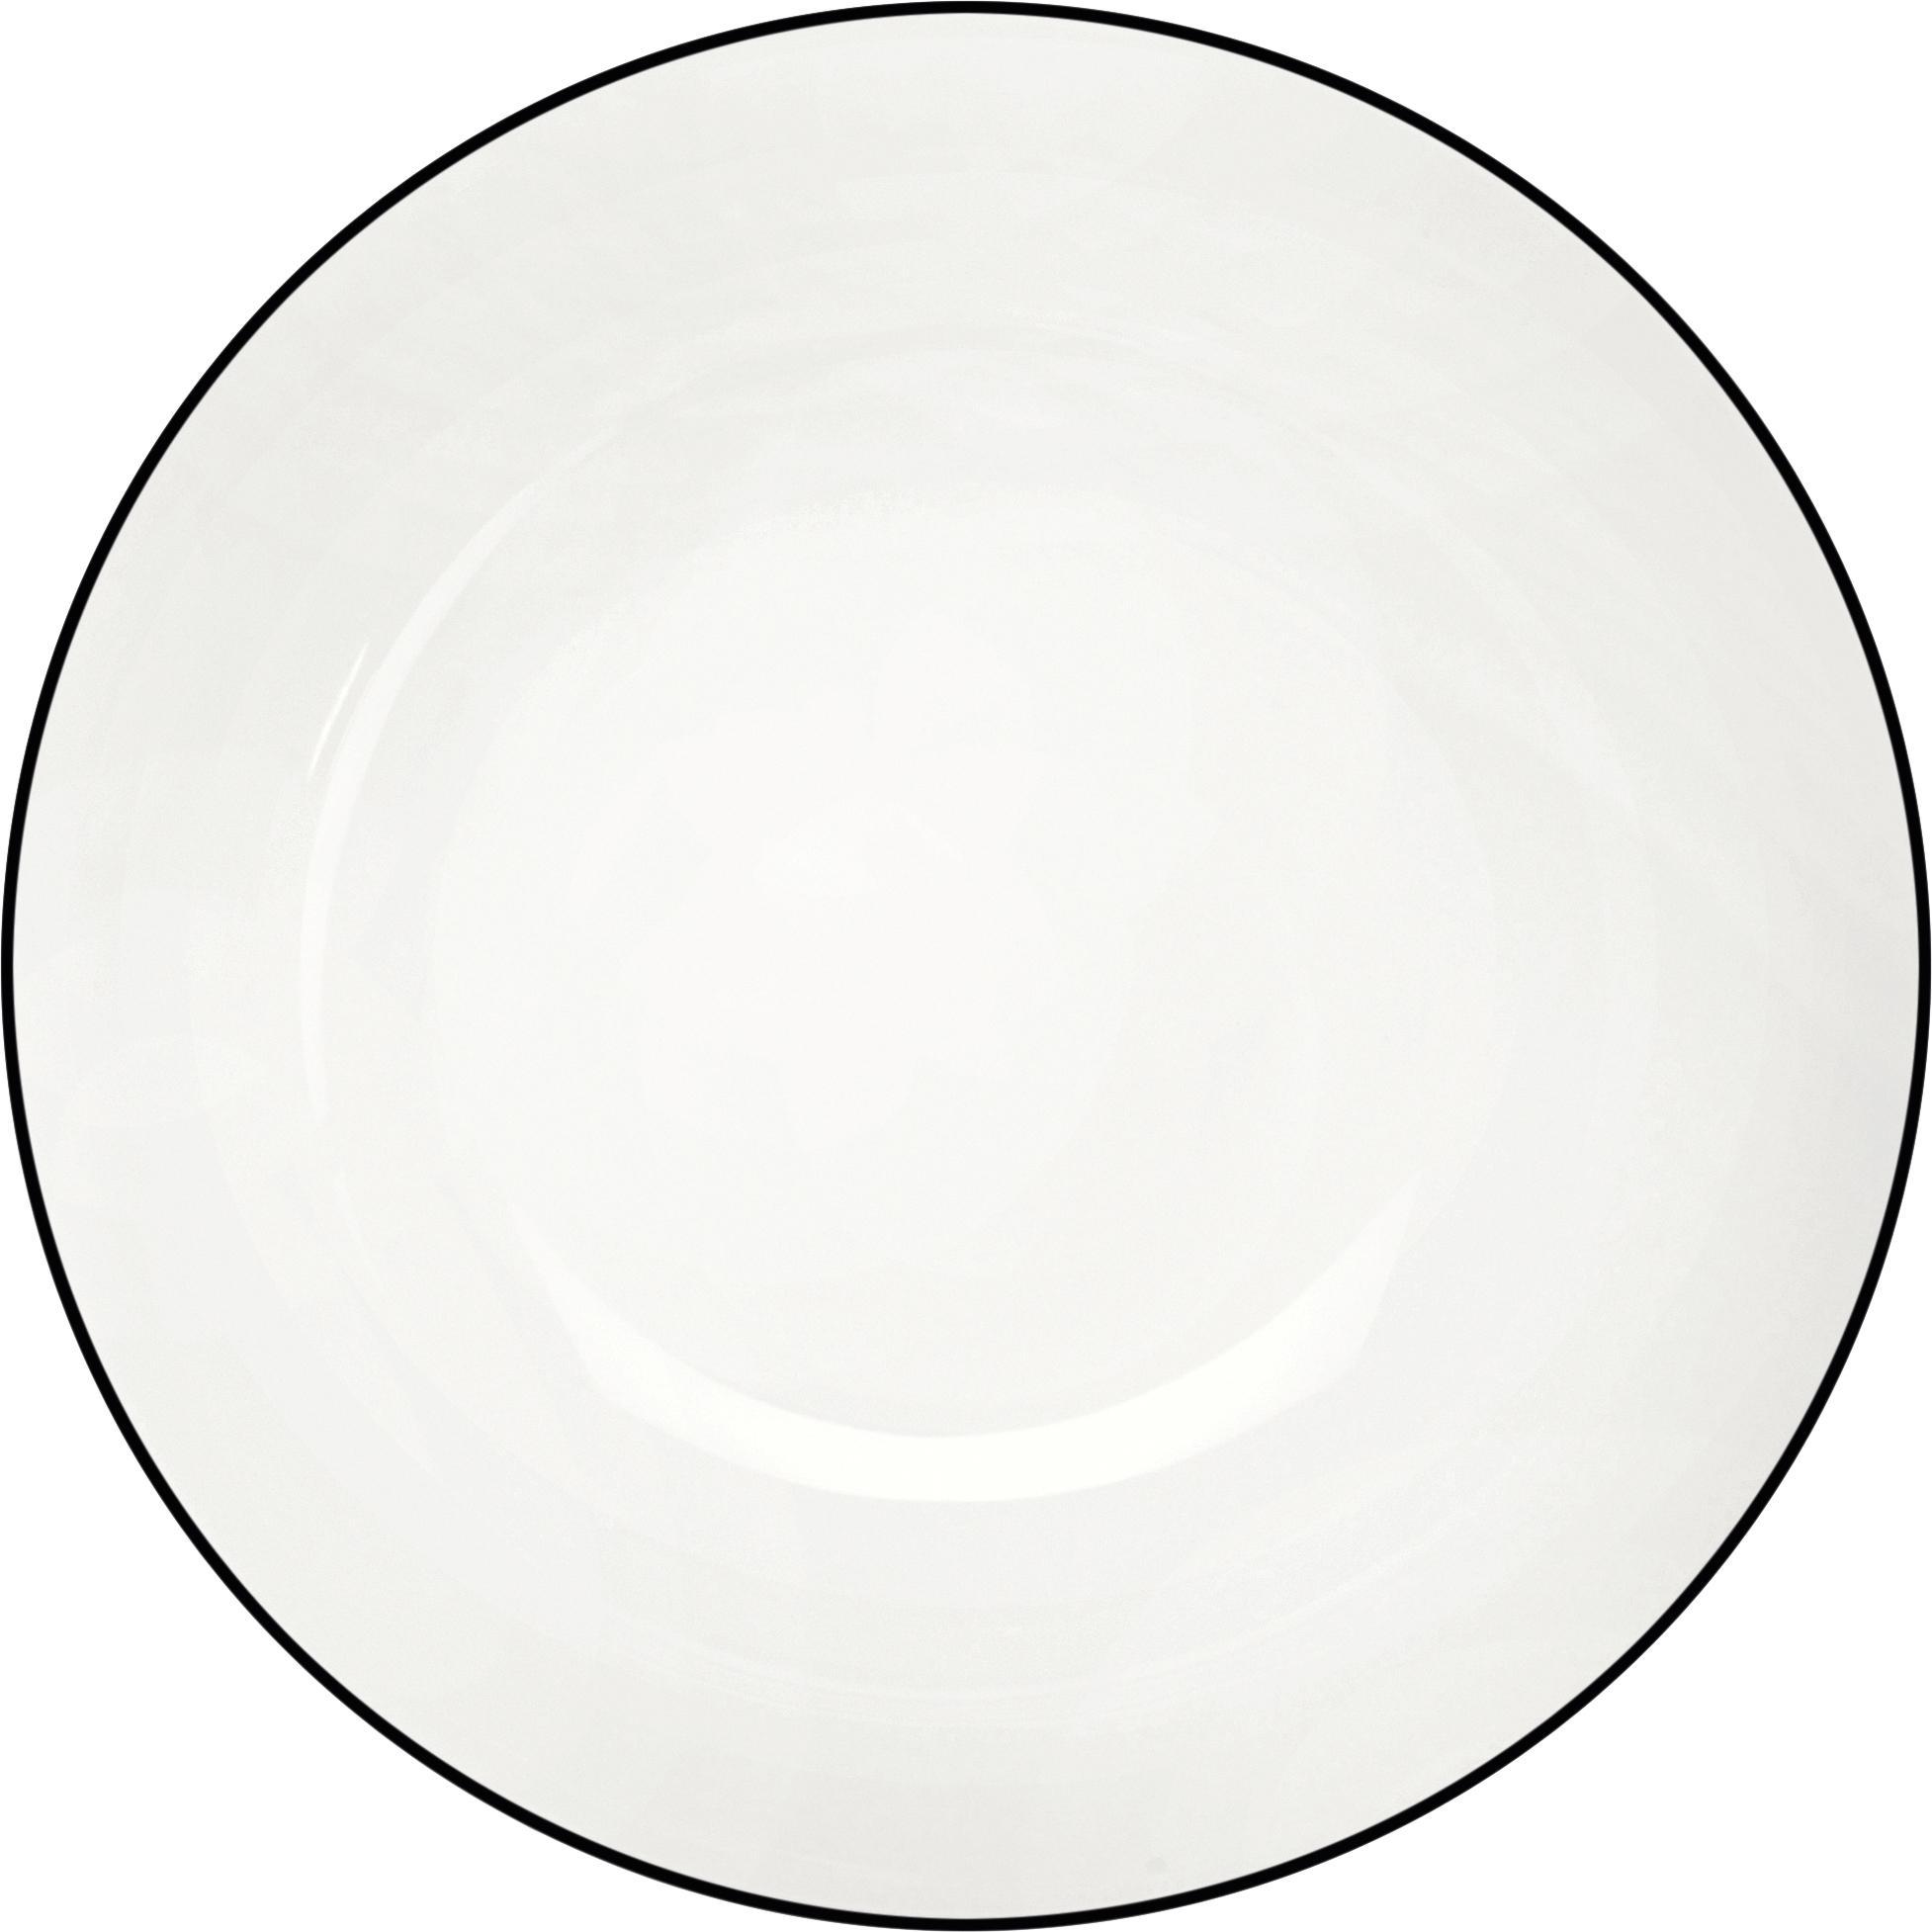 Piattino da dessert á table ligne noir 4 pz, Porcellana Fine Bone China, Bianco Bordo: nero, Ø 21 cm